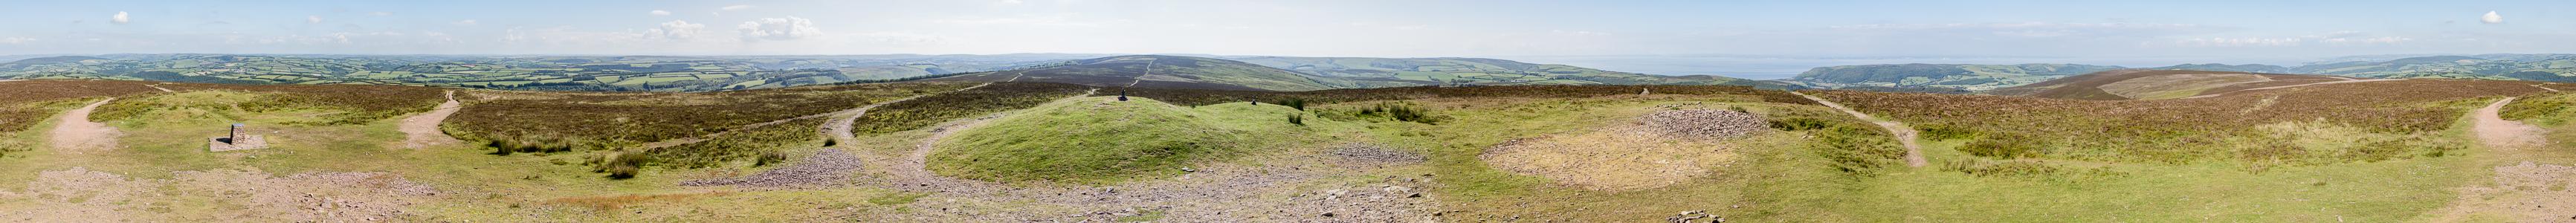 Exmoor National Park Dunkery Hill: Dunkery Beacon (520 m)